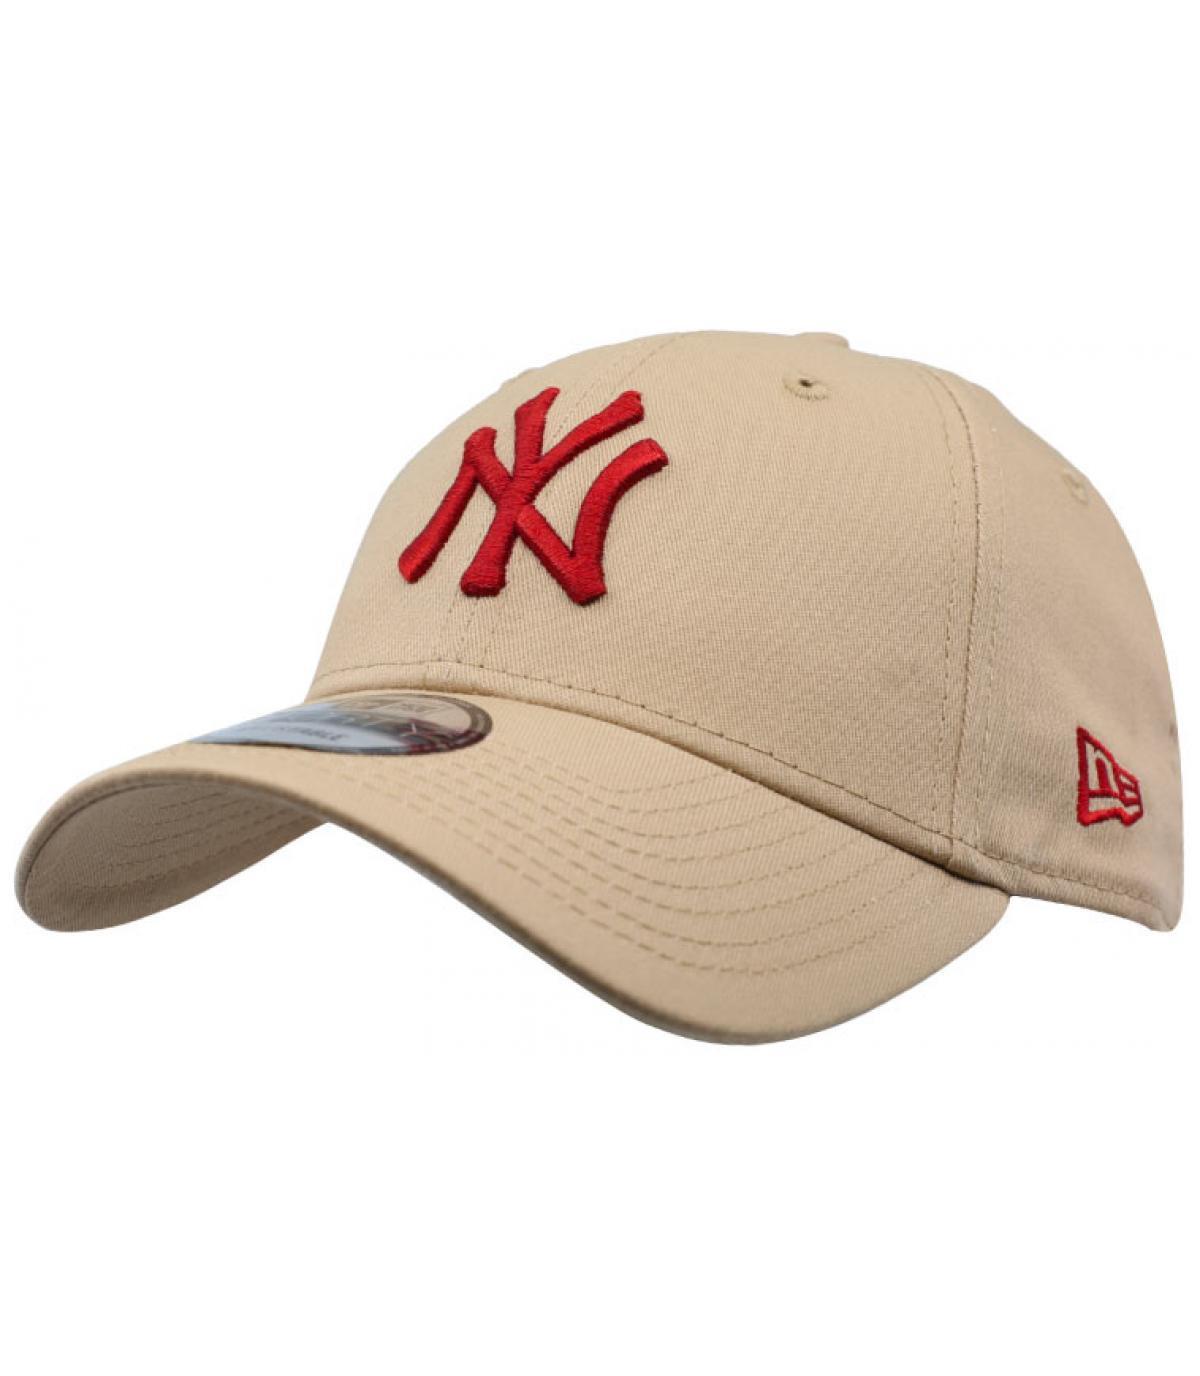 Cap NY beige bordeaux